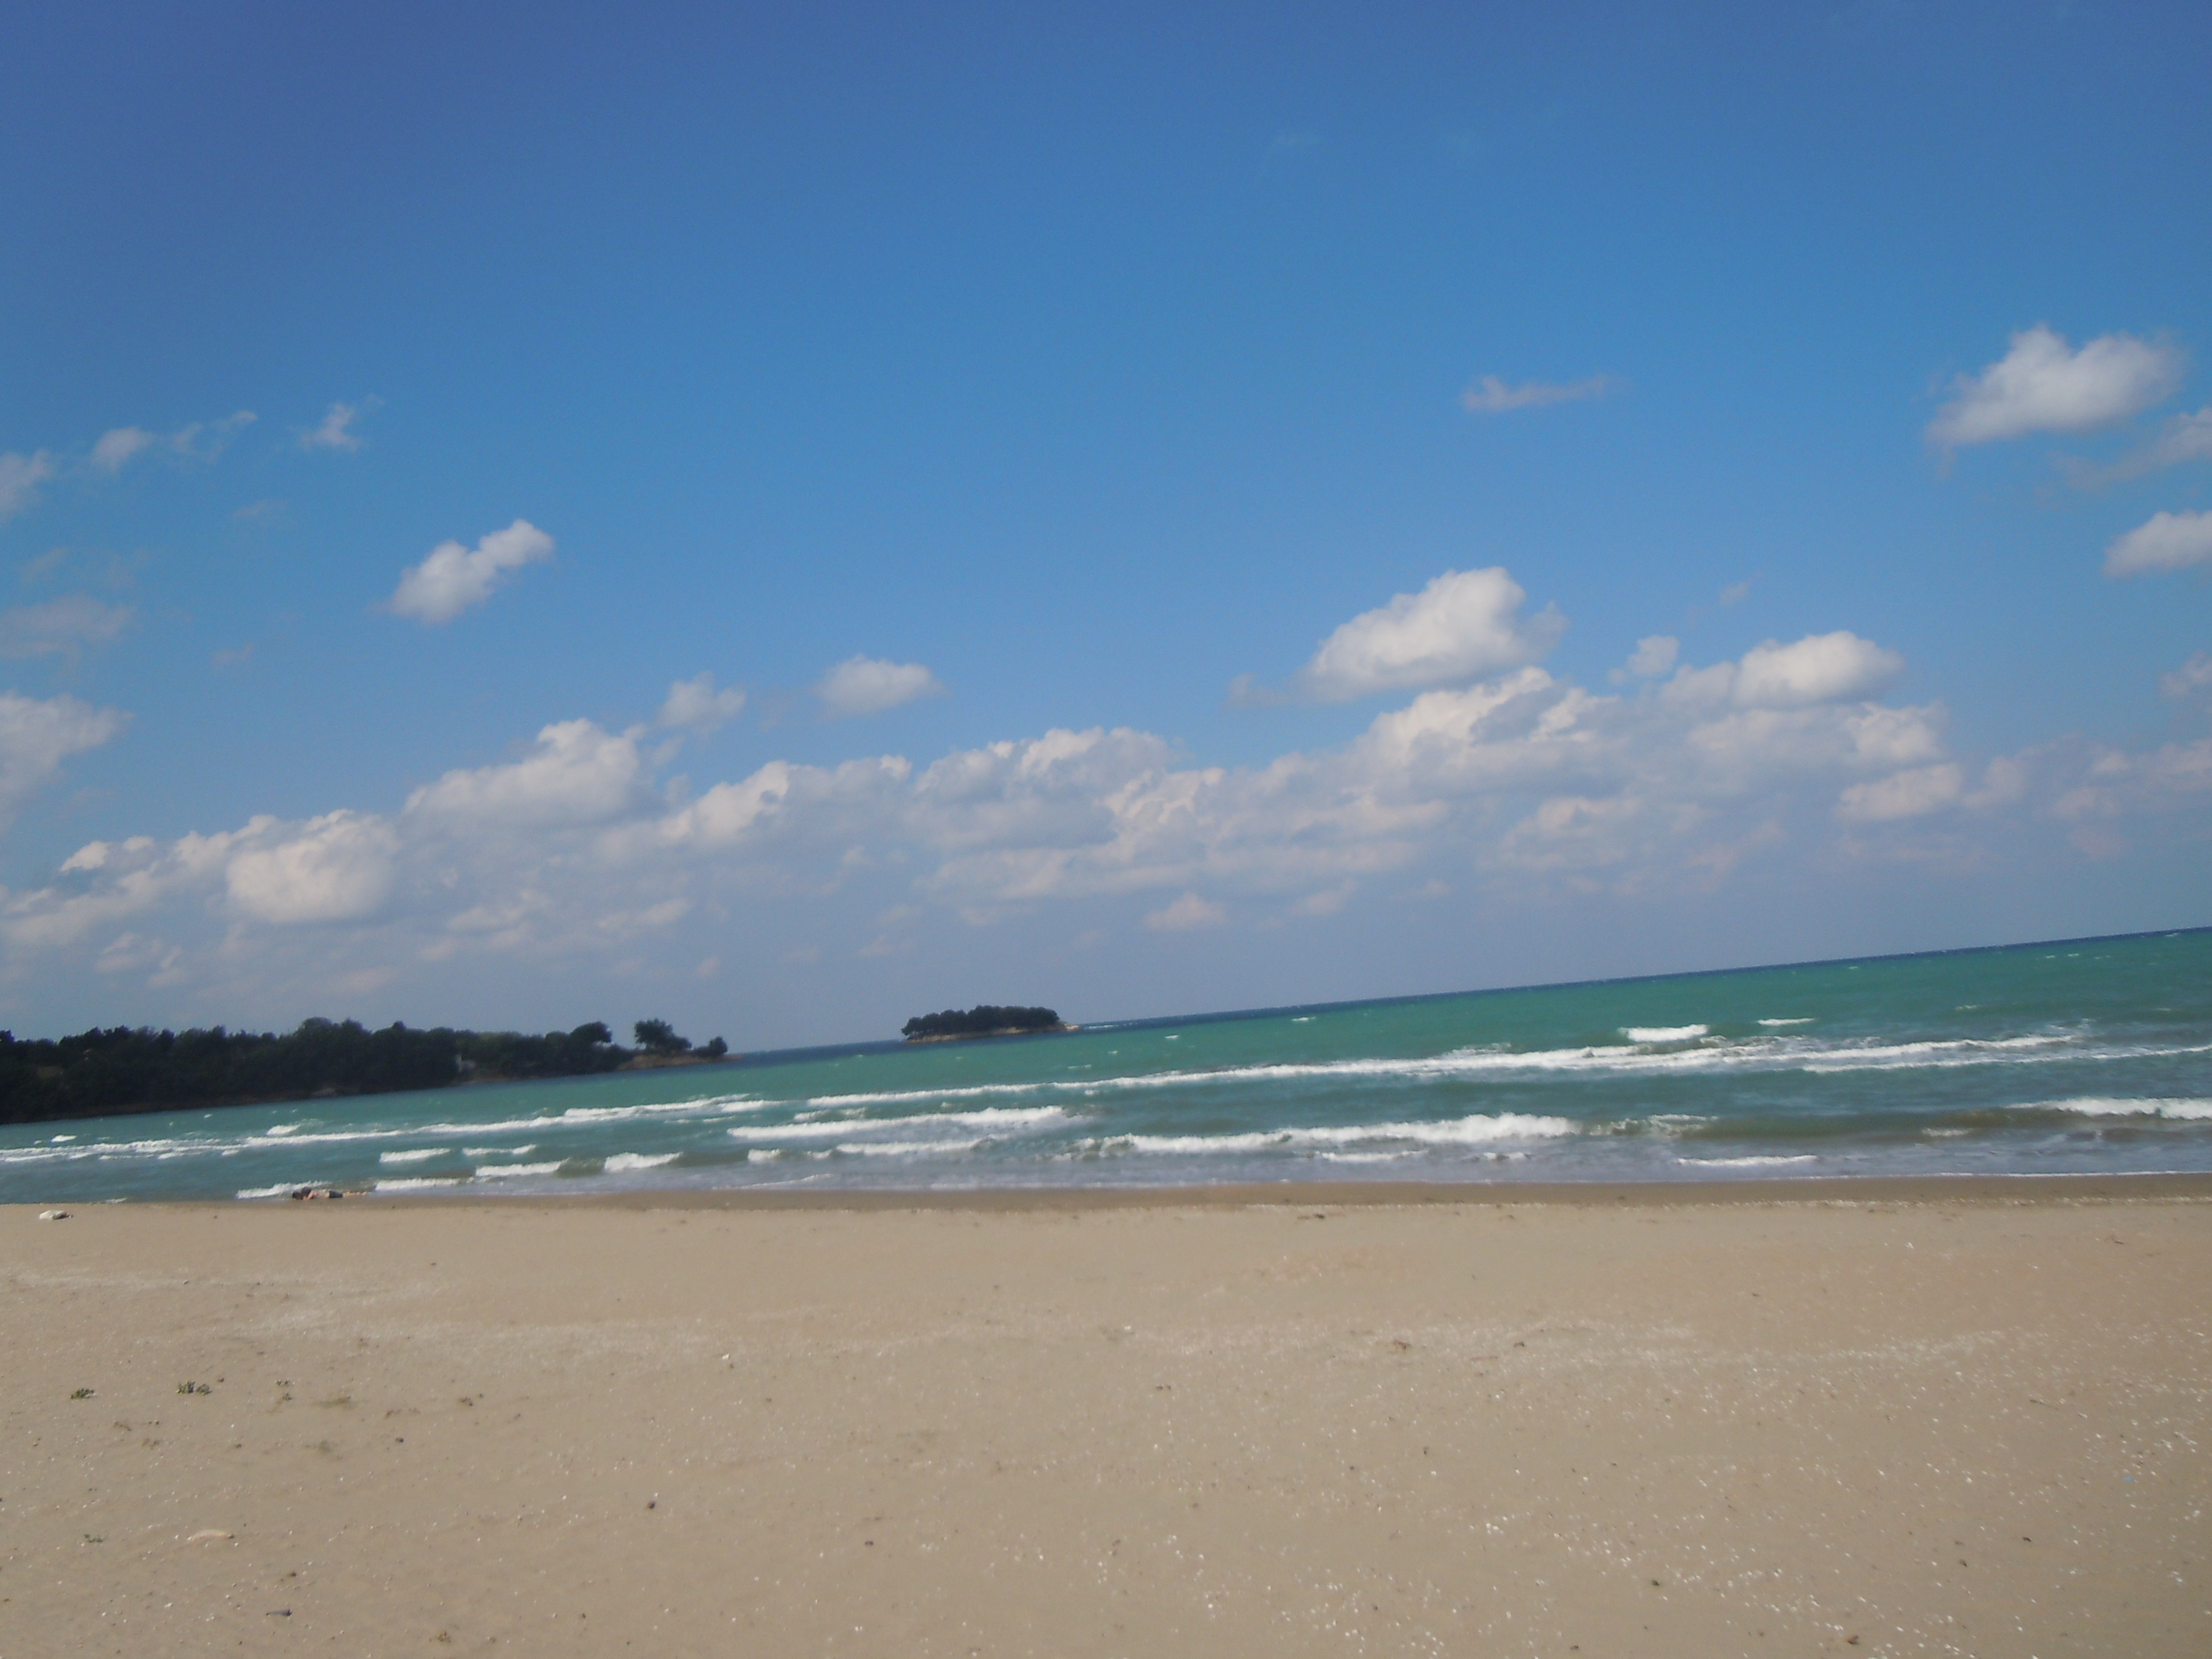 Genis kumsal harika bir plaj